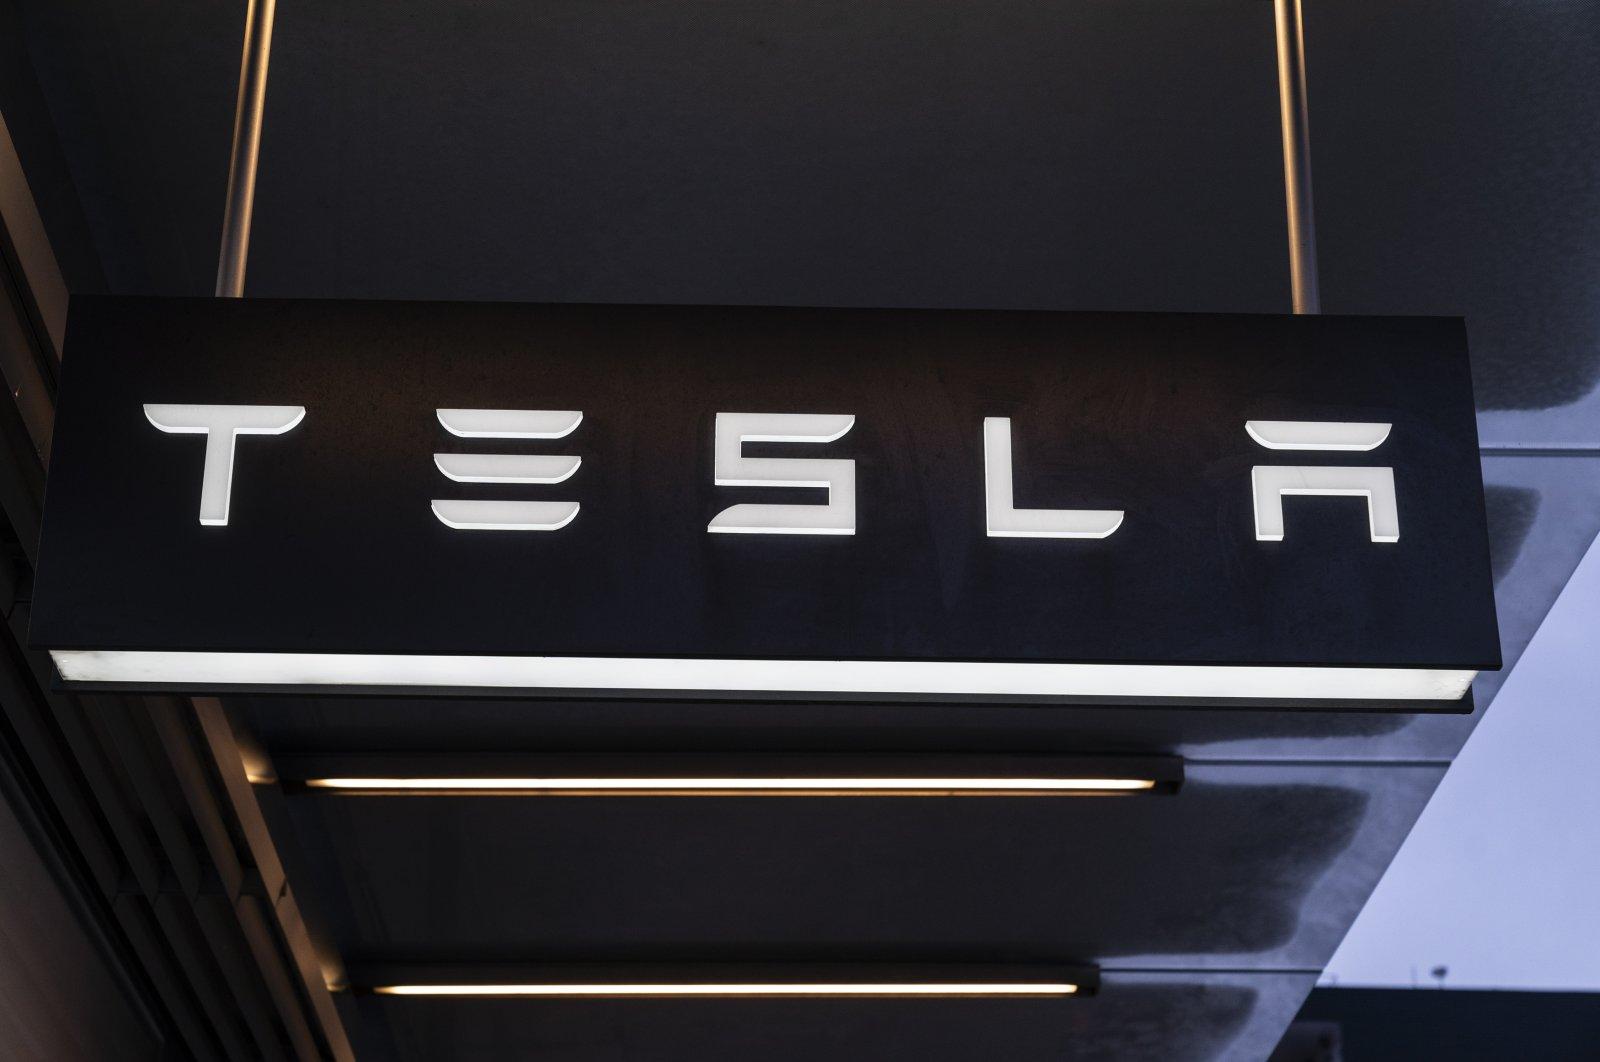 View of Tesla company logo at the entrance of dealership on Washington Street in New York, Dec. 20, 2020. (Lev Radin/Sipa USA via Reuters)